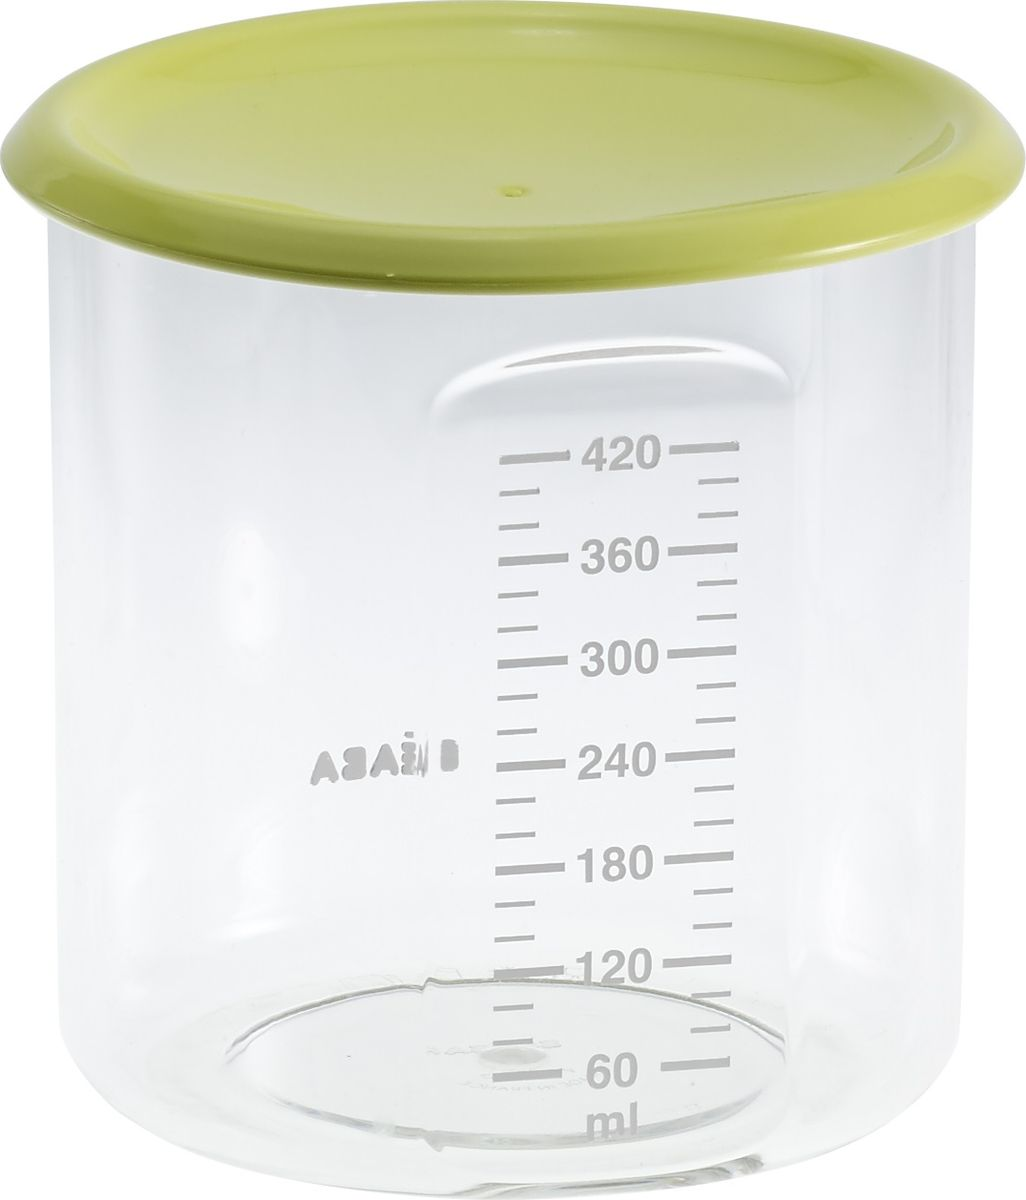 Beaba Контейнер для детского питания Maxi+Portion Tritan Neon 420 мл